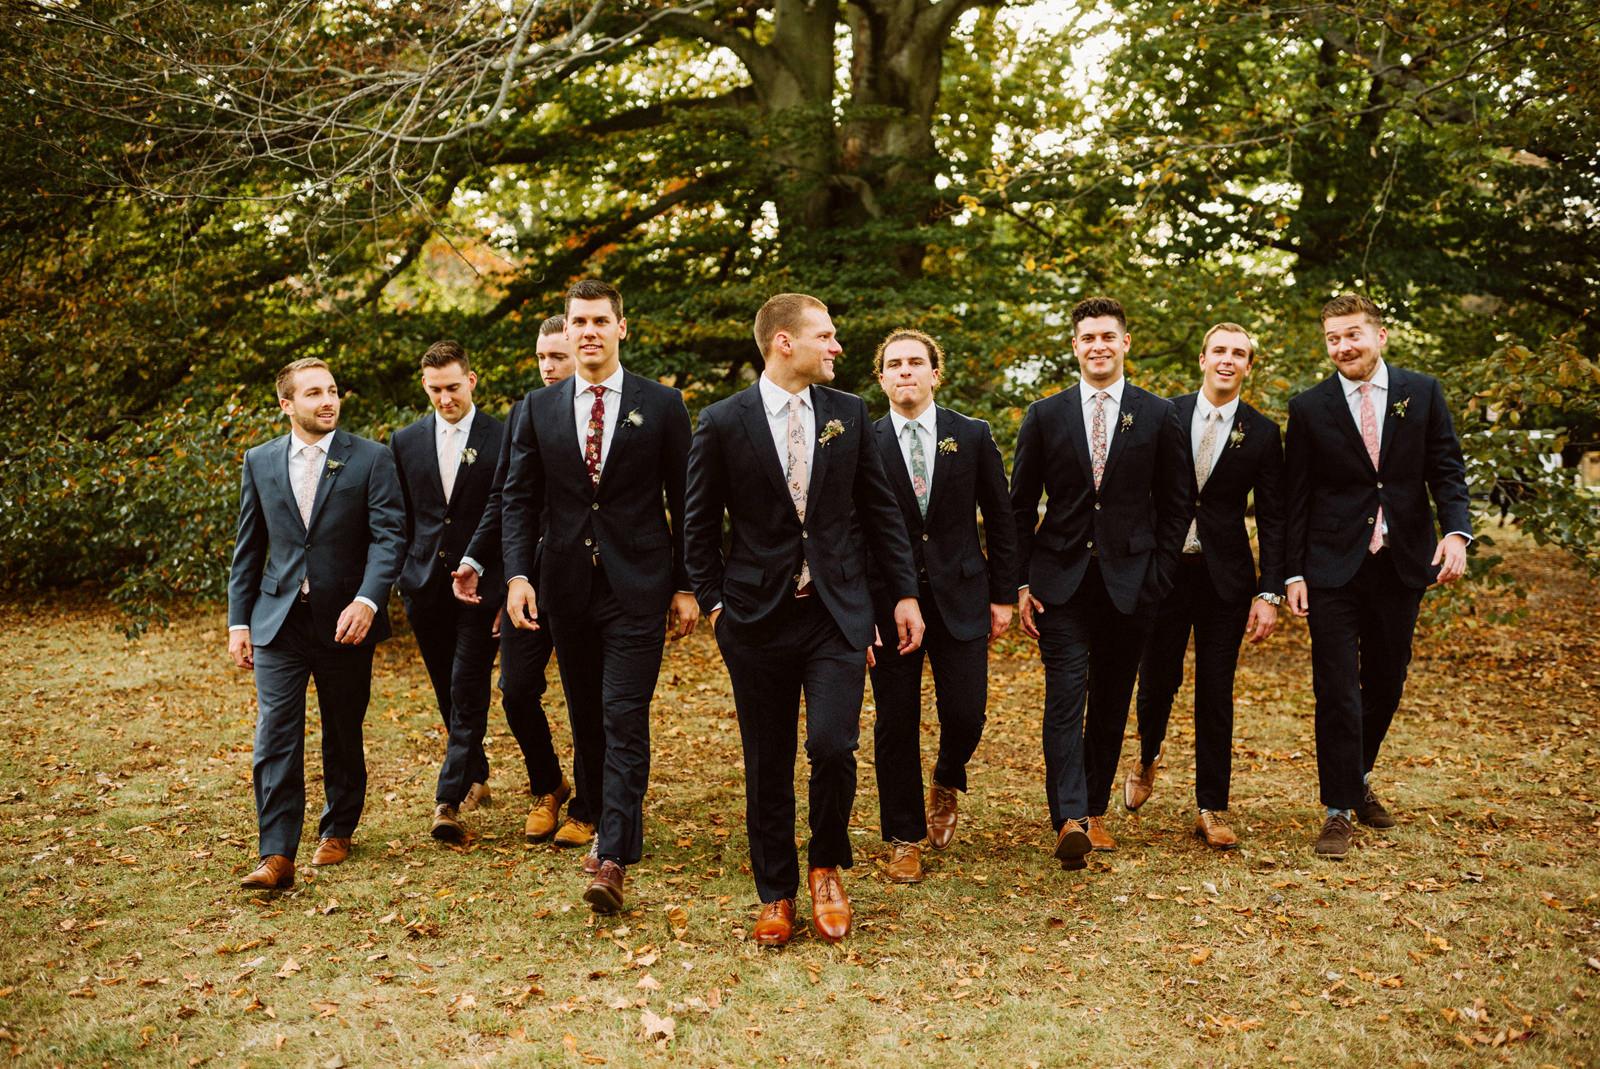 bridgeport-wedding-101 BRIDGEPORT, CONNECTICUT BACKYARD WEDDING